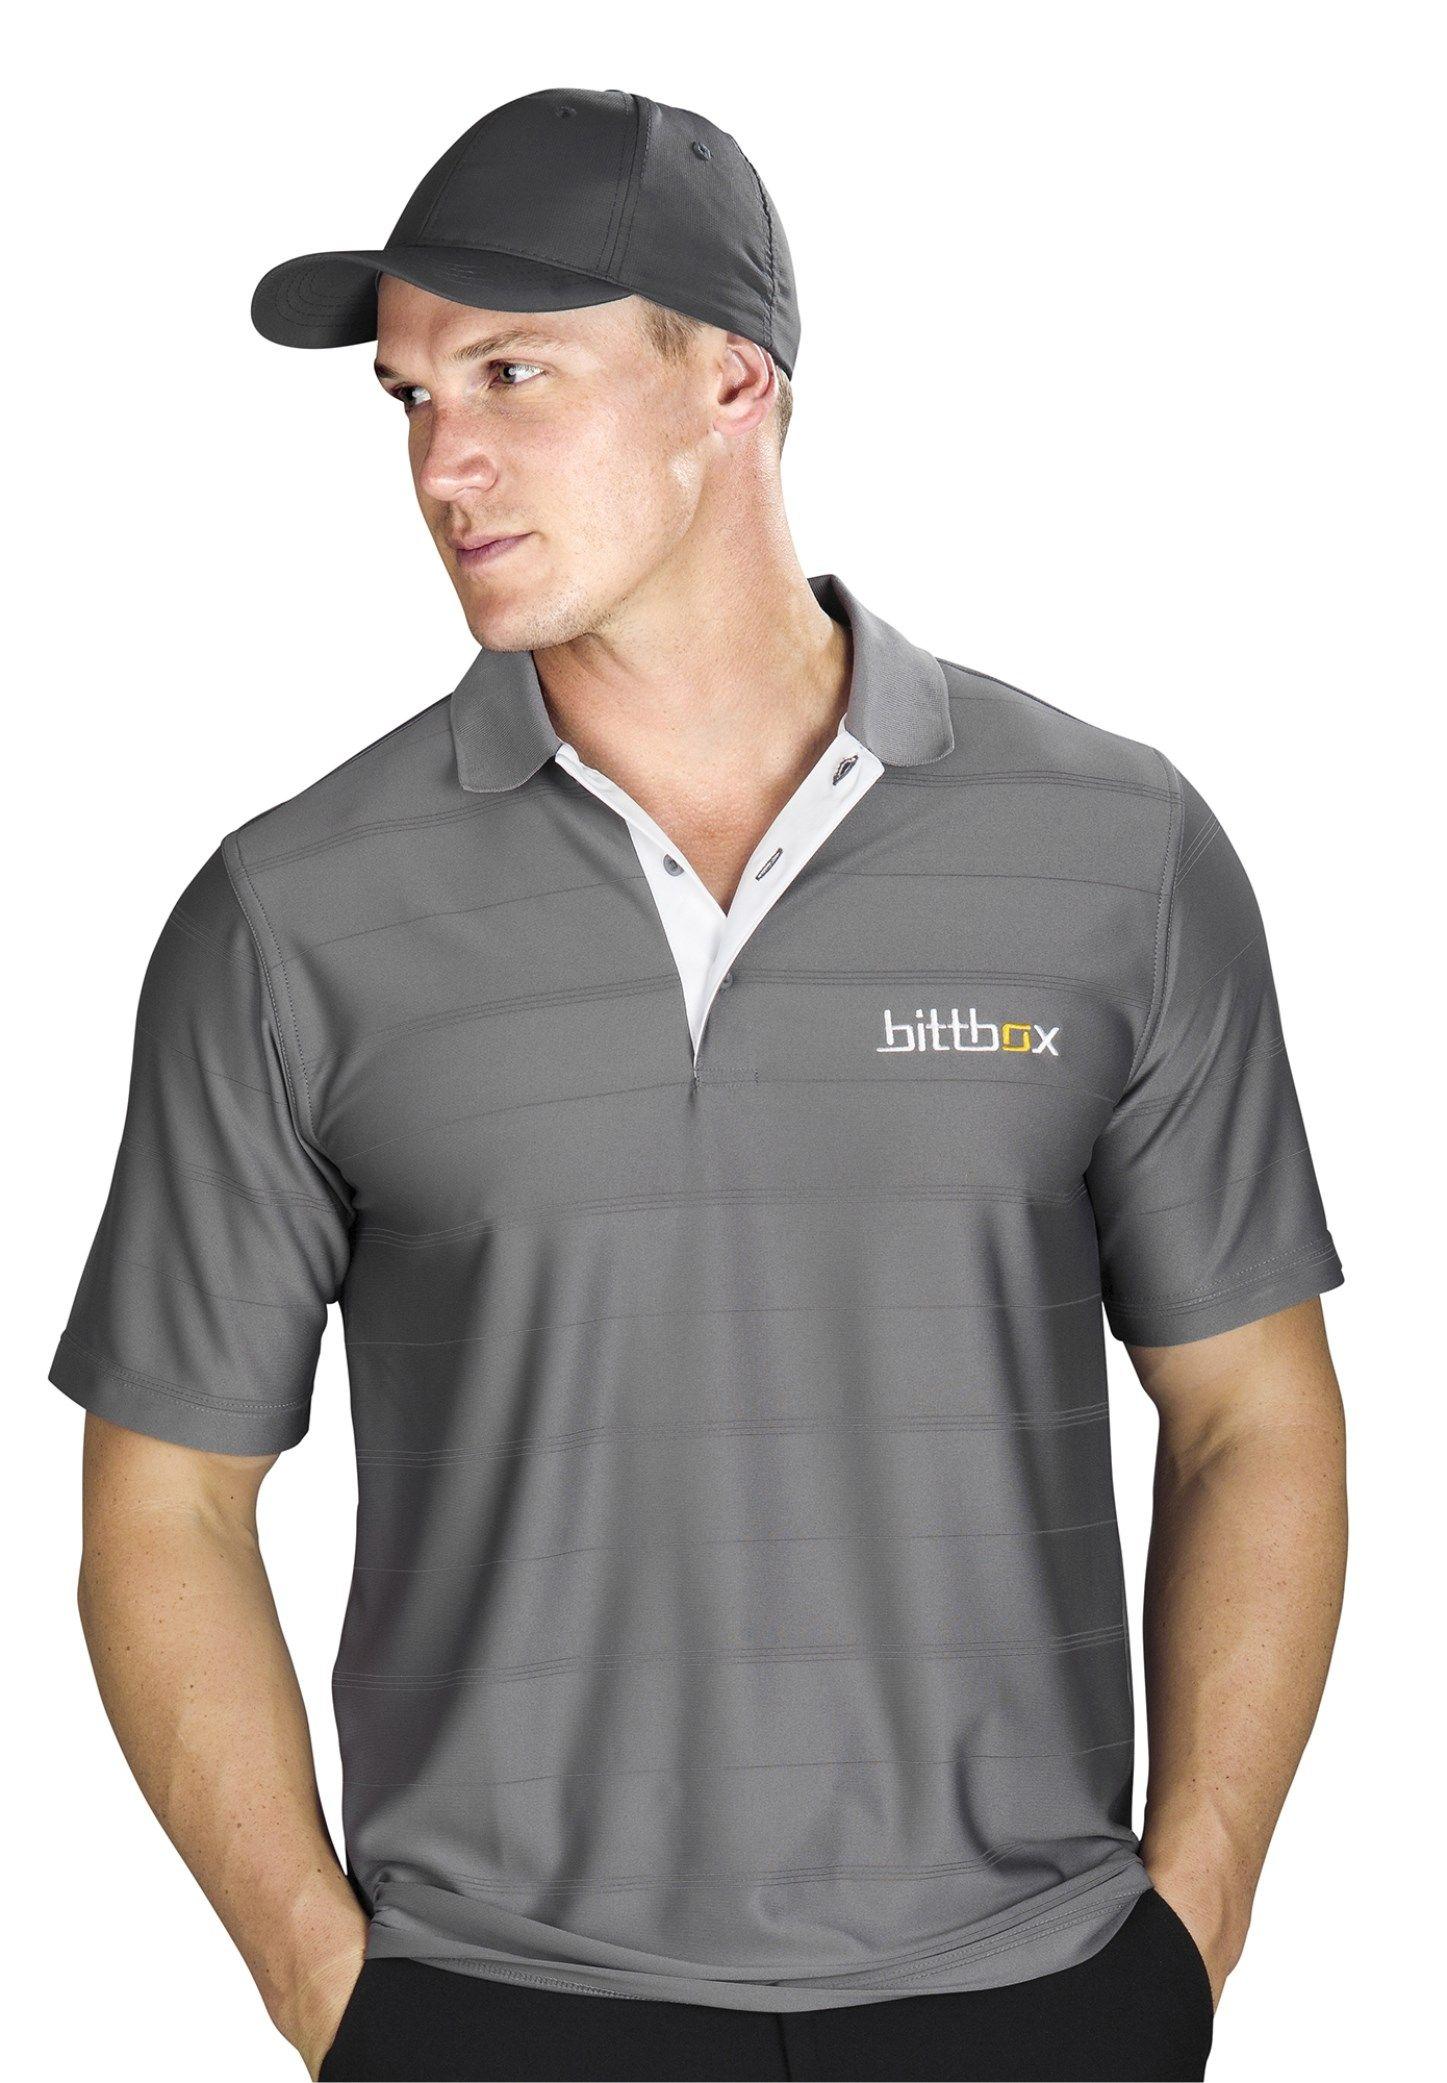 Golf Shirt Companies South Africa Golf shirts, Corporate